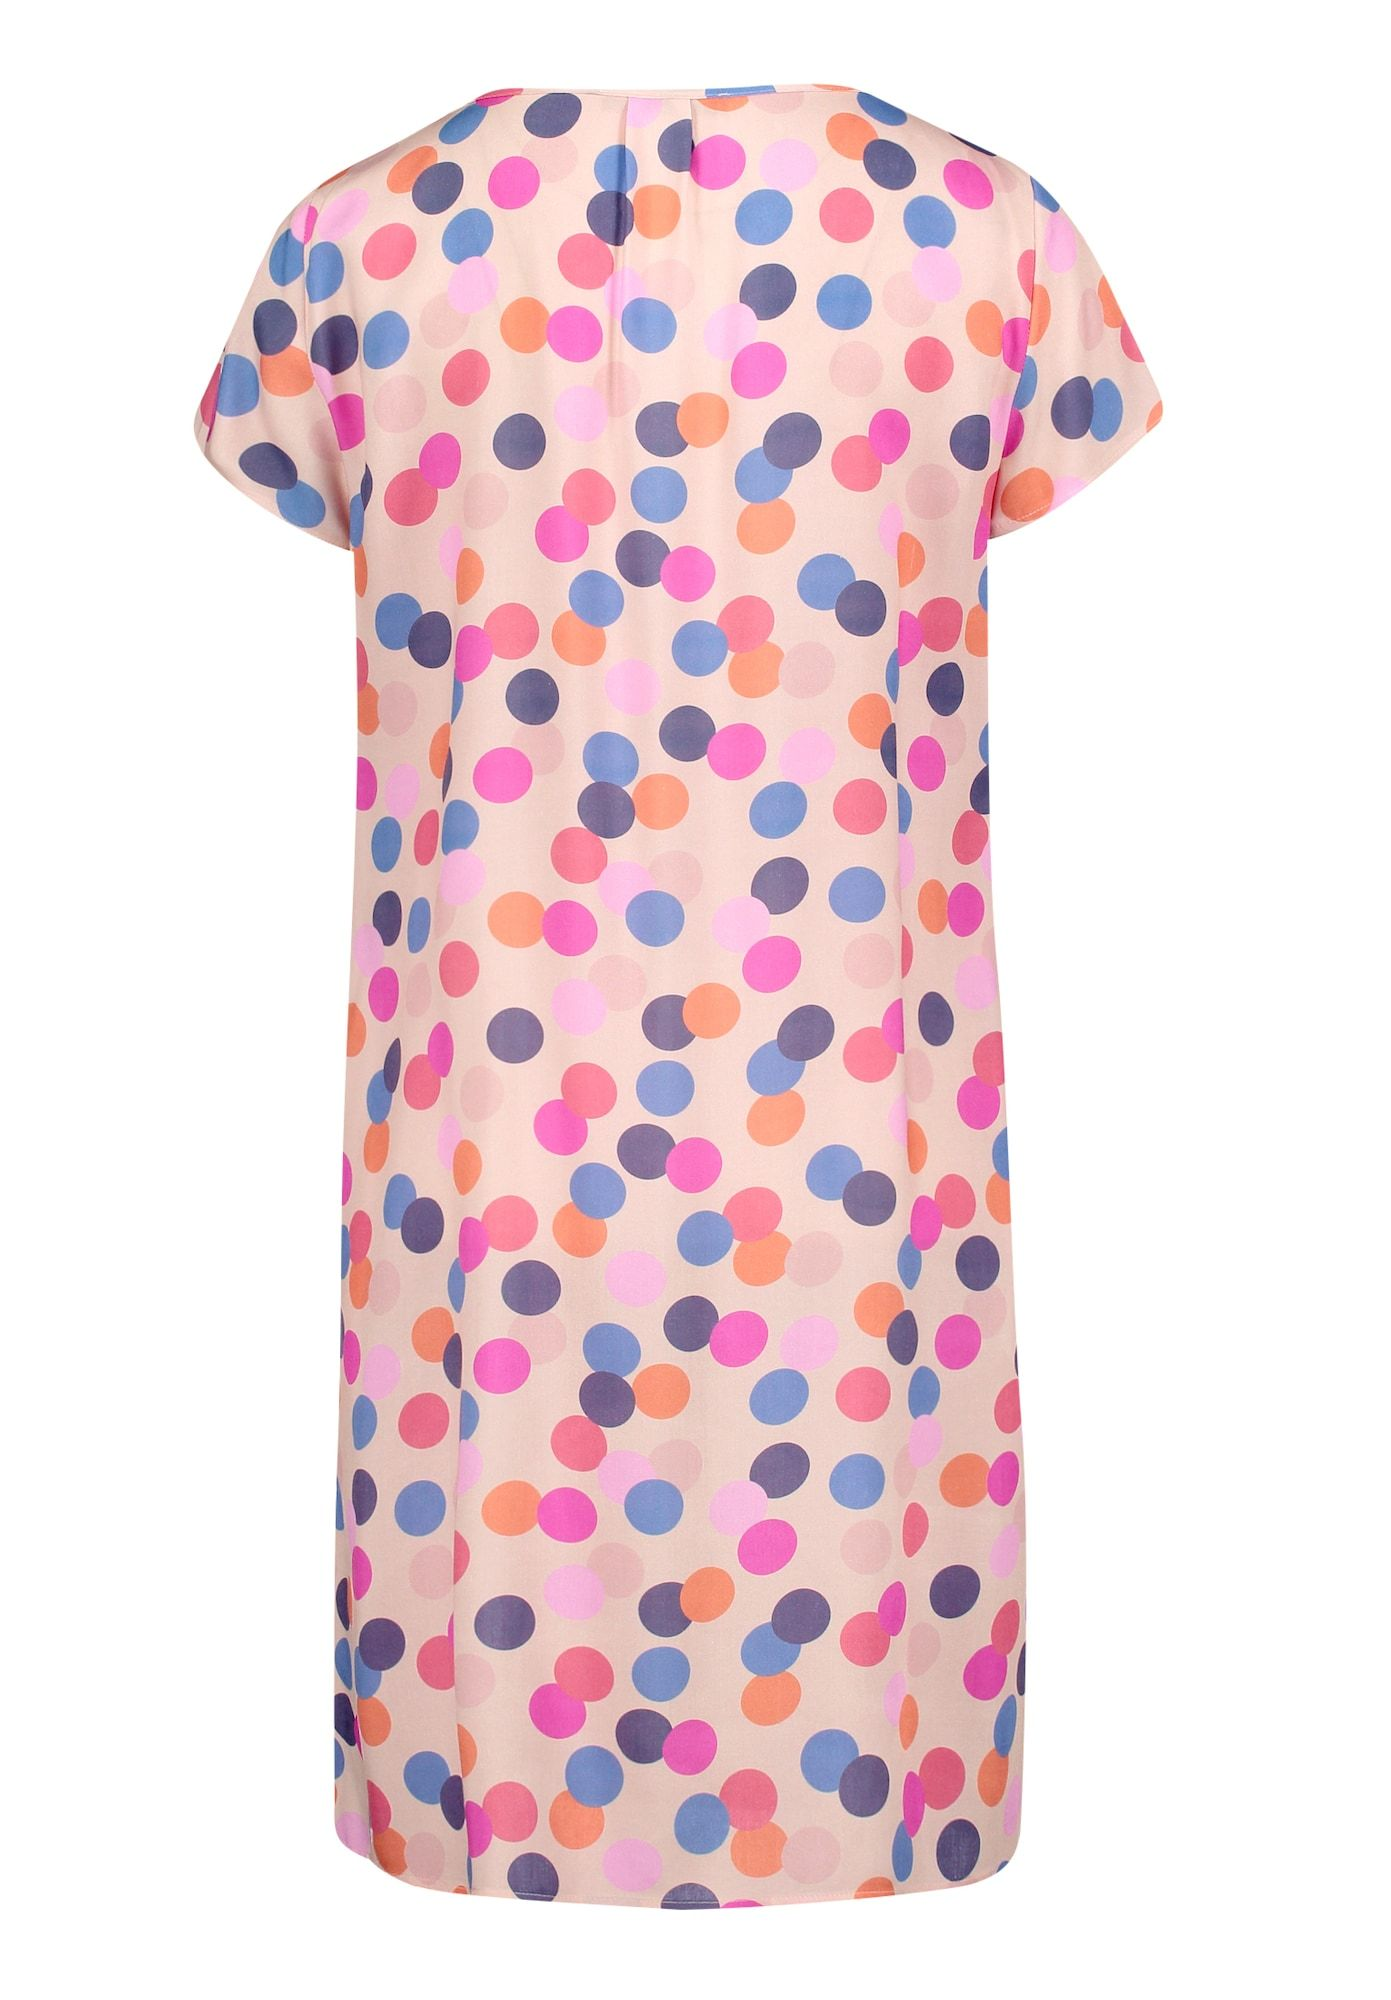 Betty Barclay Kleid Damen, Blau / Lila / Orange / Rosa, Größe 19